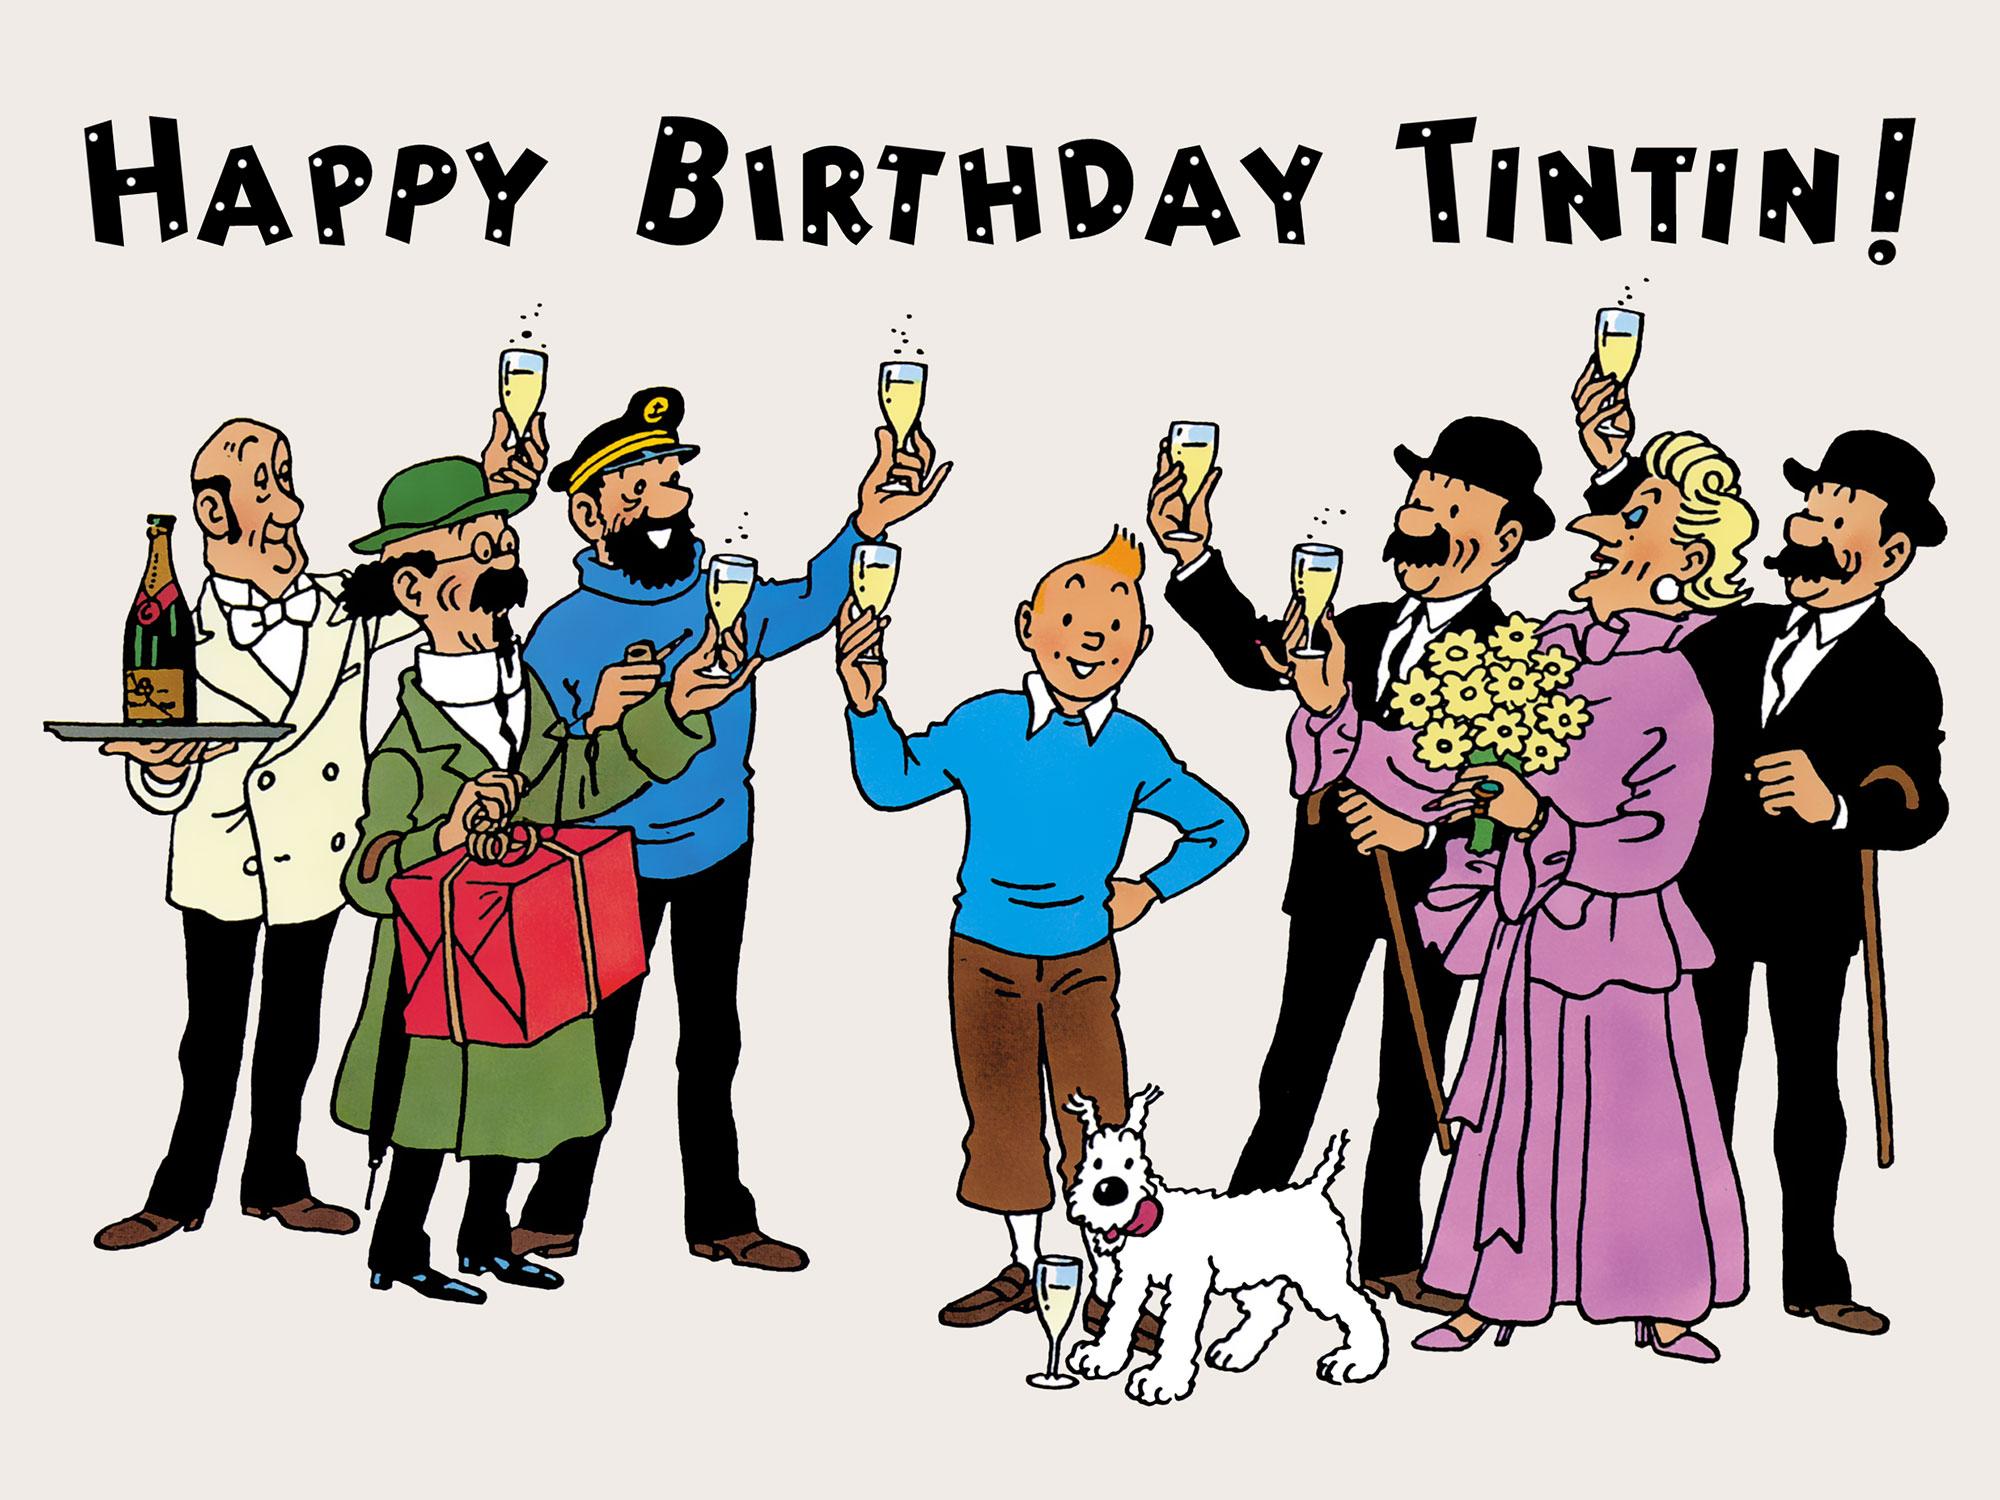 tintin happy birthday